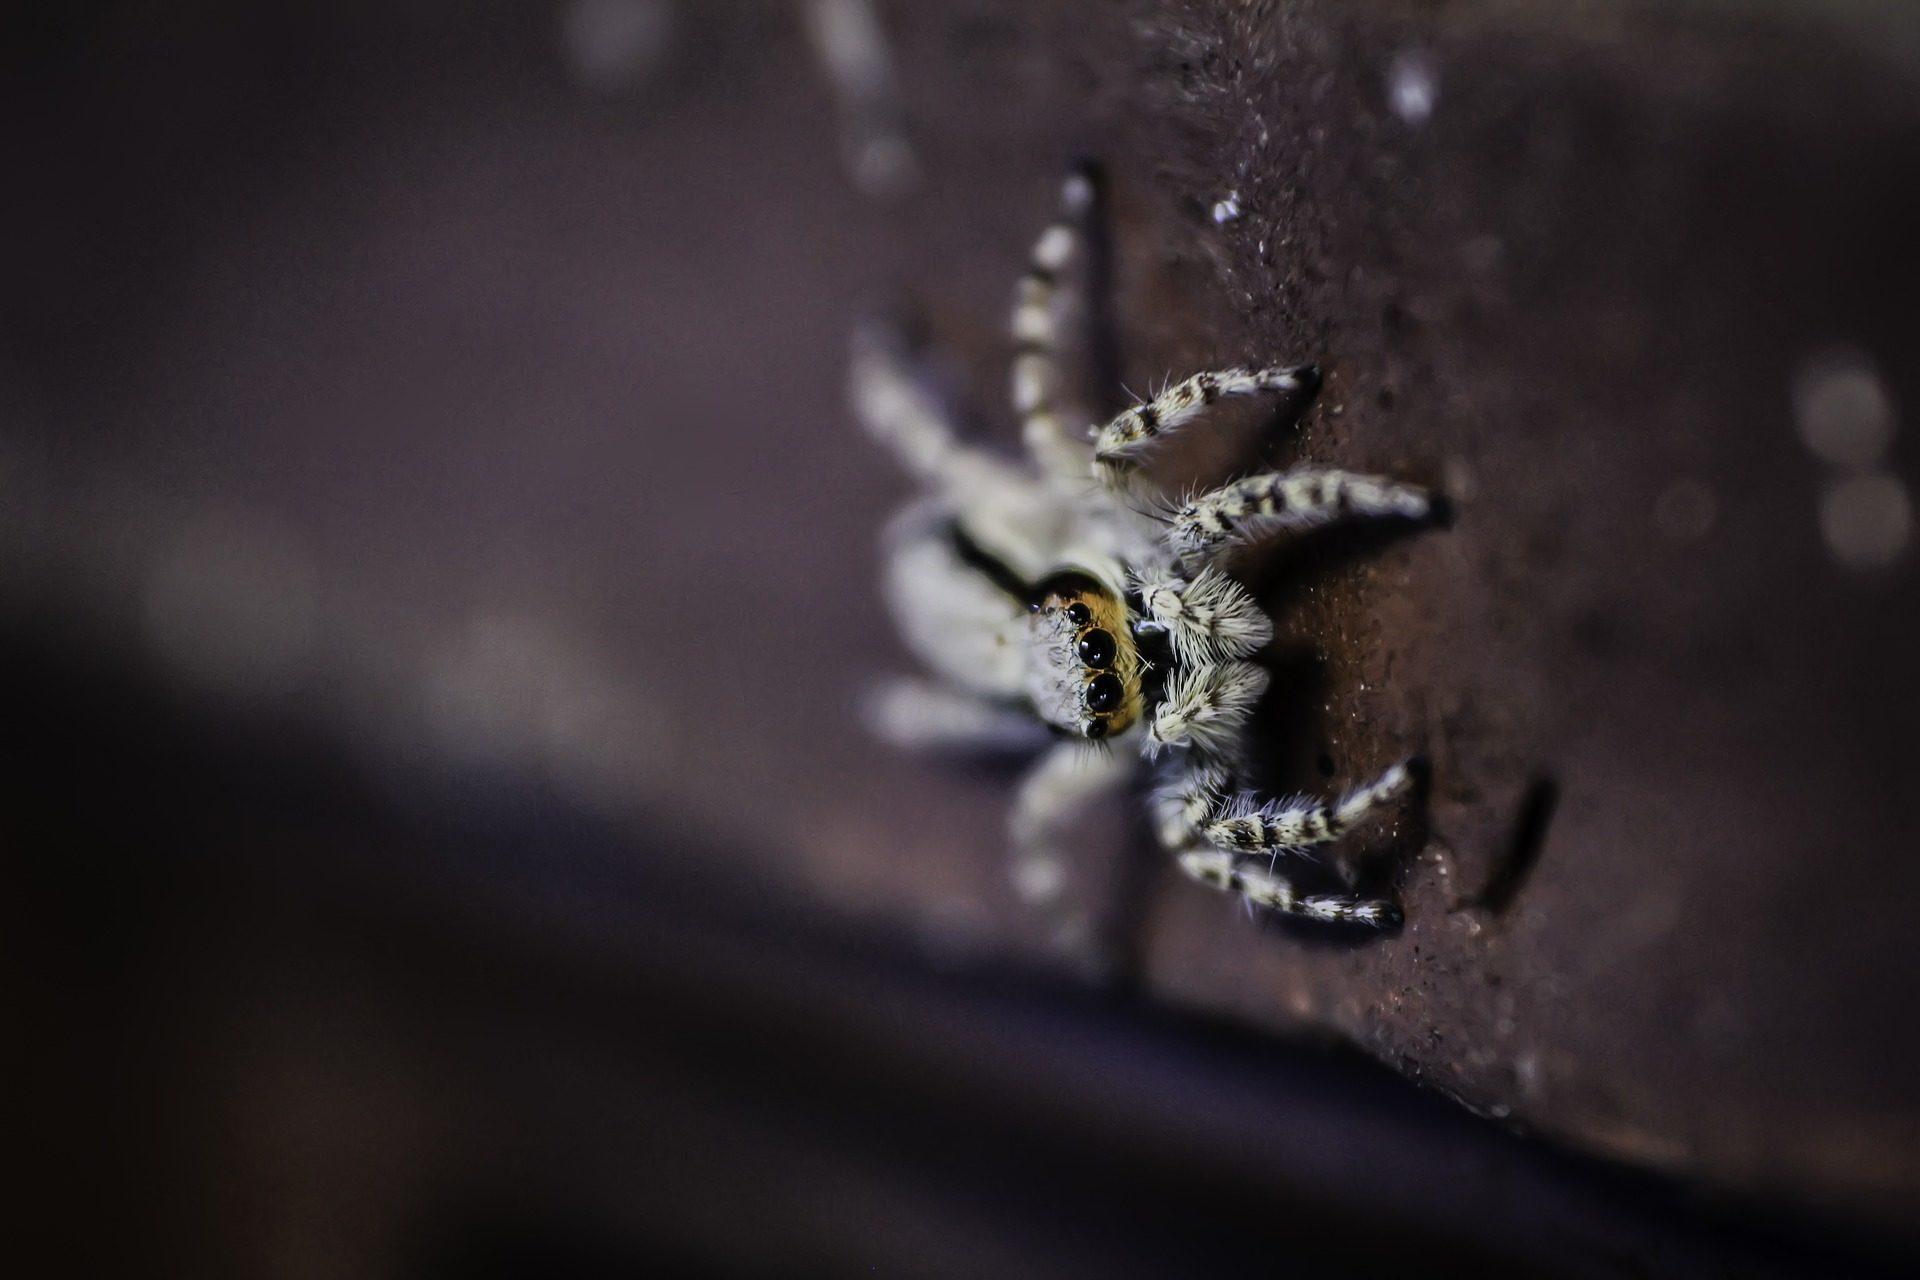 Insekt, araña, Spinne, gruselig, Angst, Panik - Wallpaper HD - Prof.-falken.com